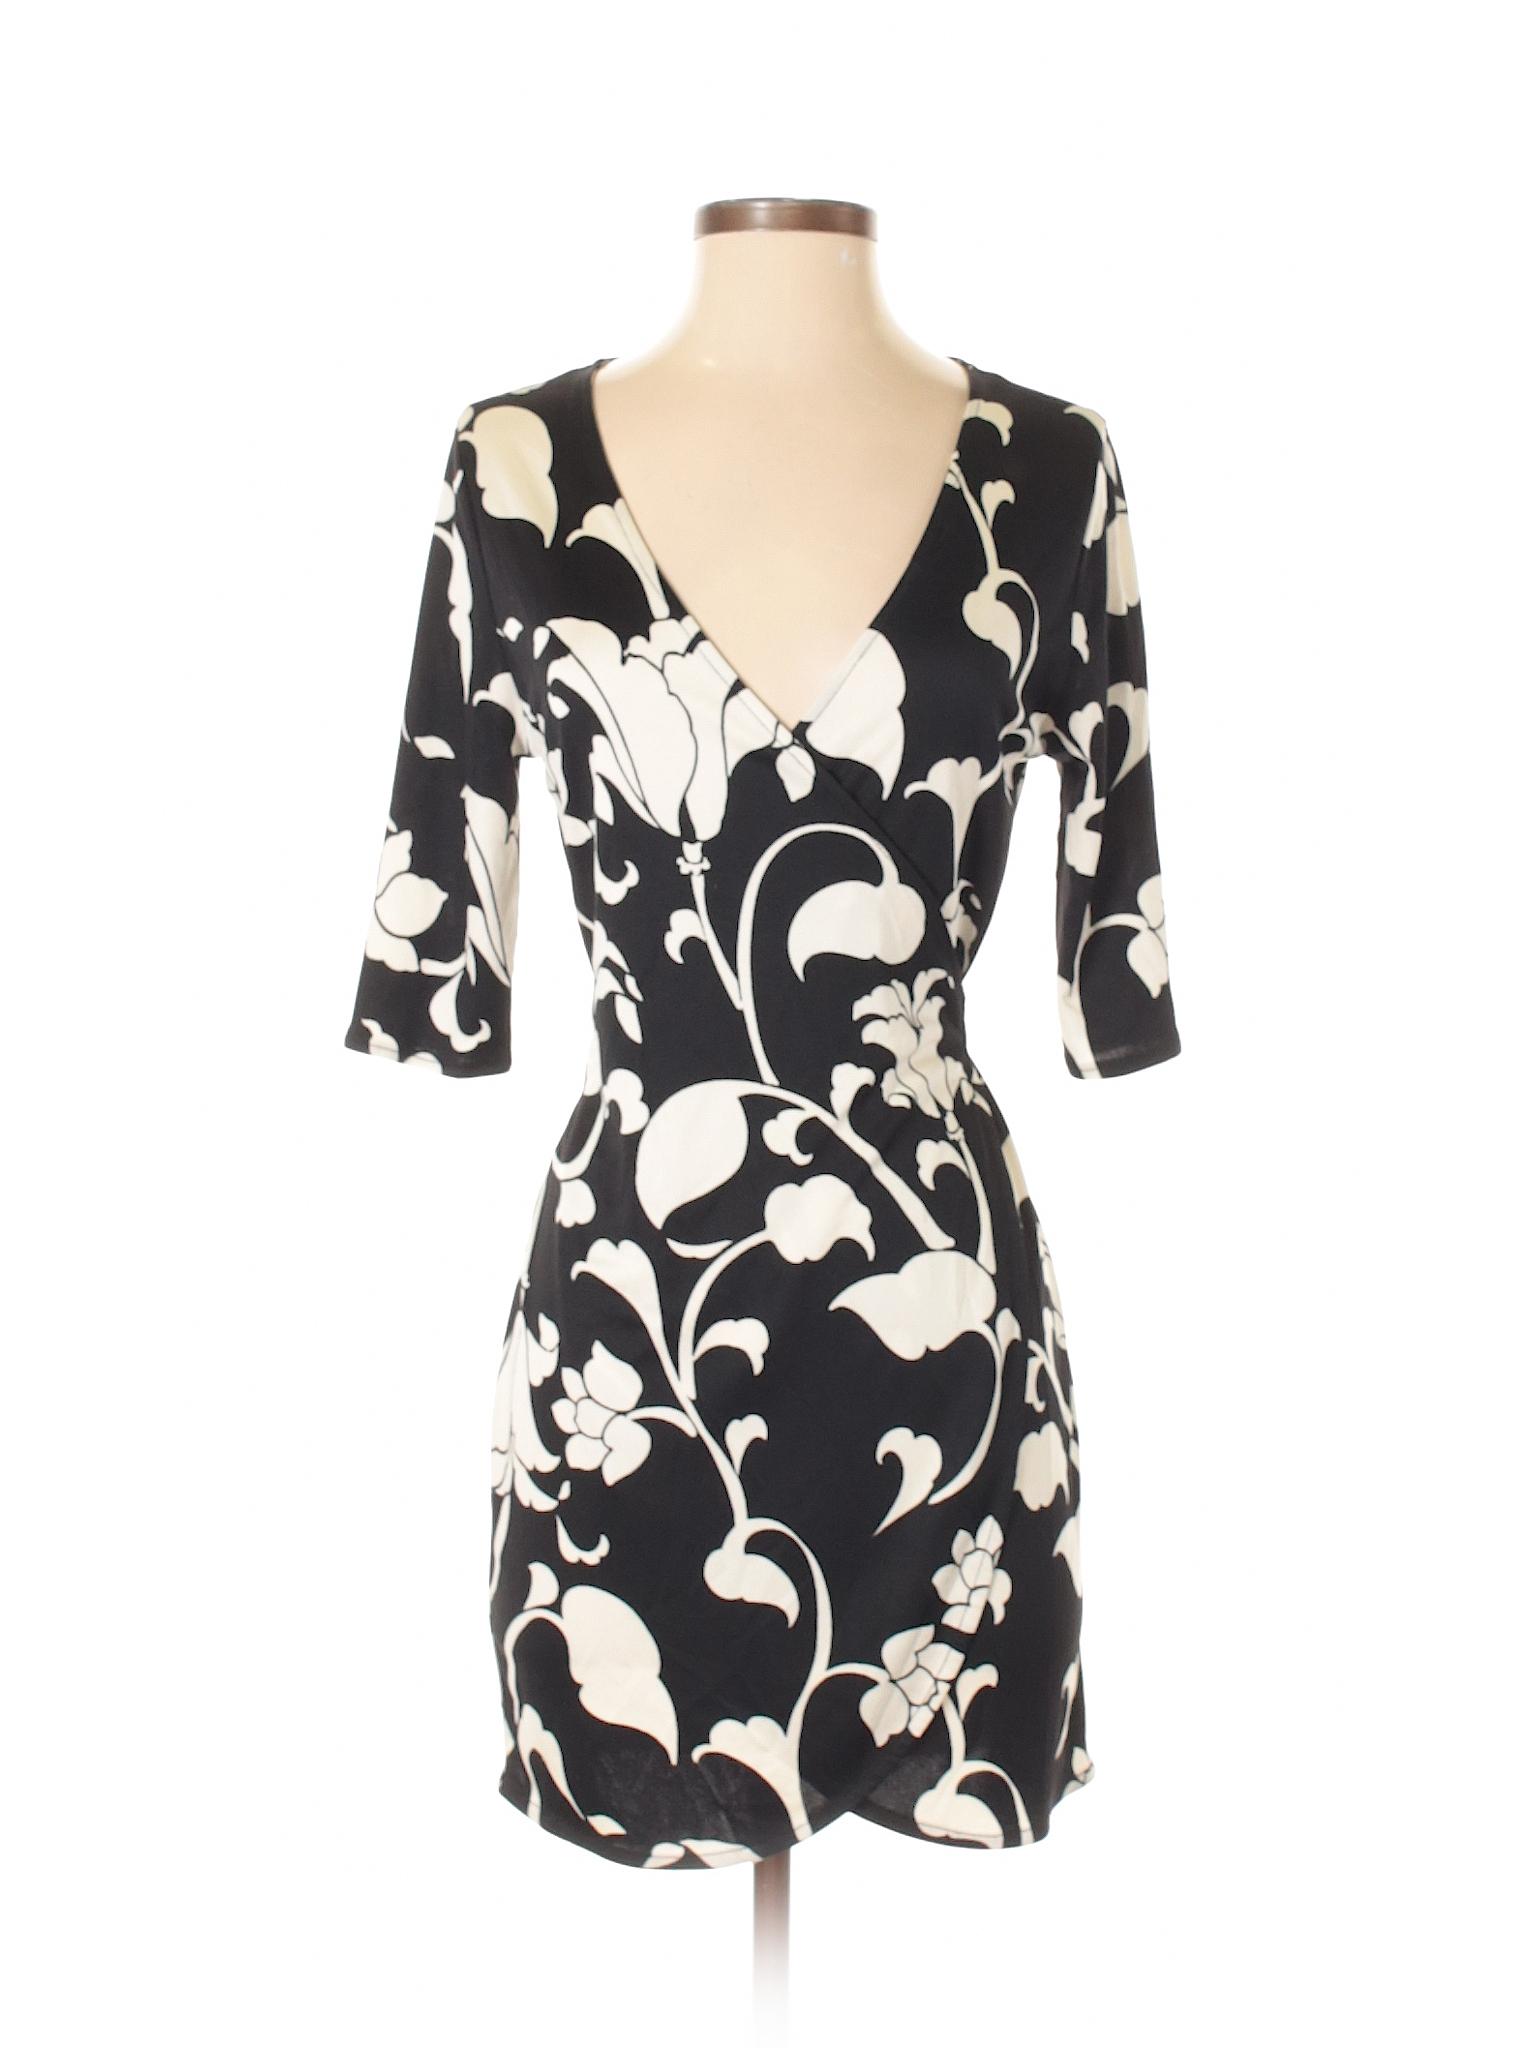 Casual Market Selling Dress Black White House WZWa8Iq